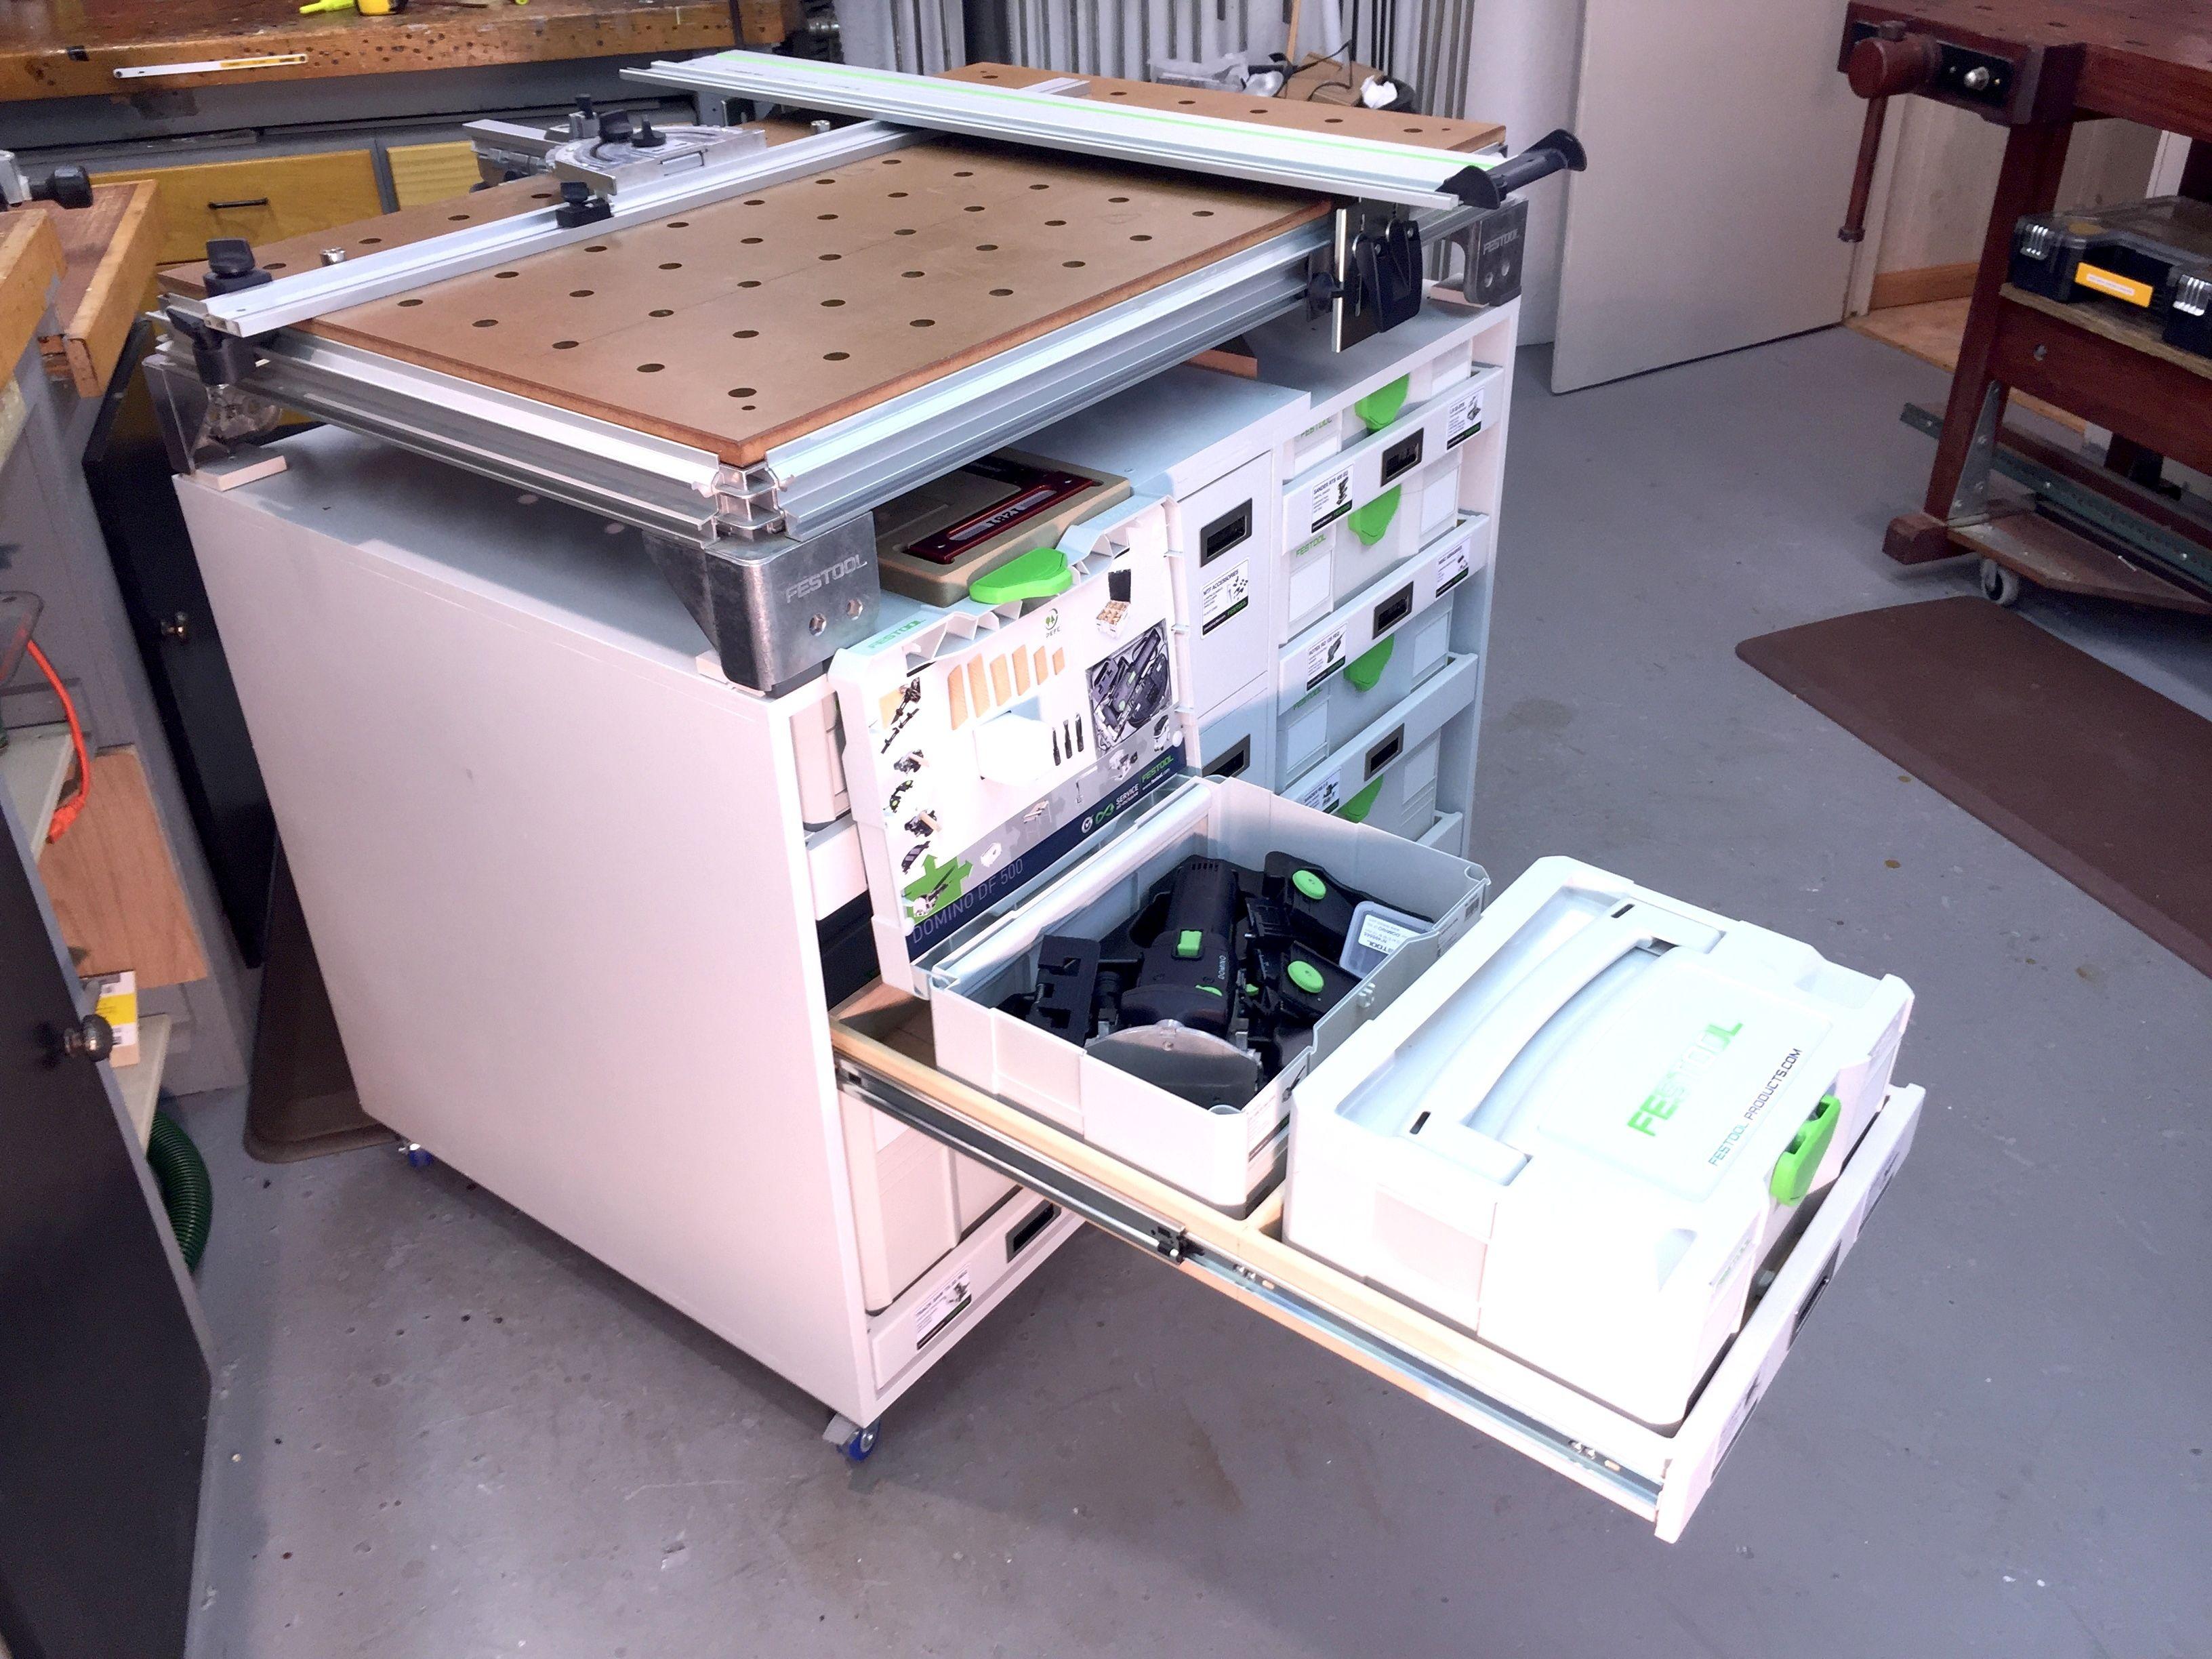 SYS A-Z drawers | Festool - MFT Workbench / Sysport ...